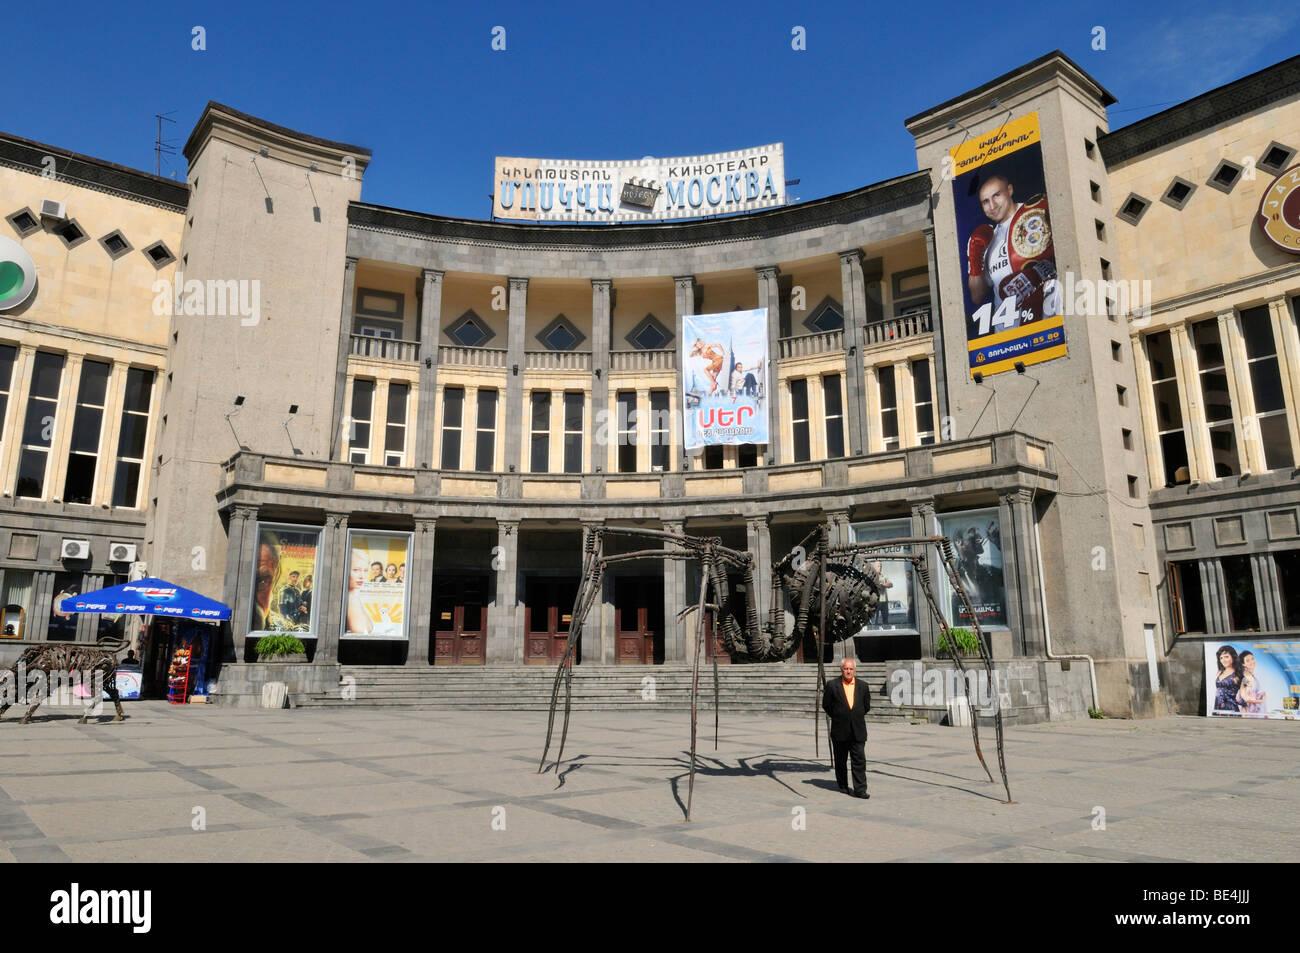 Sovjet style Moscow cinema at downtown Yerevan, Jerewan, Armenia, Asia - Stock Image